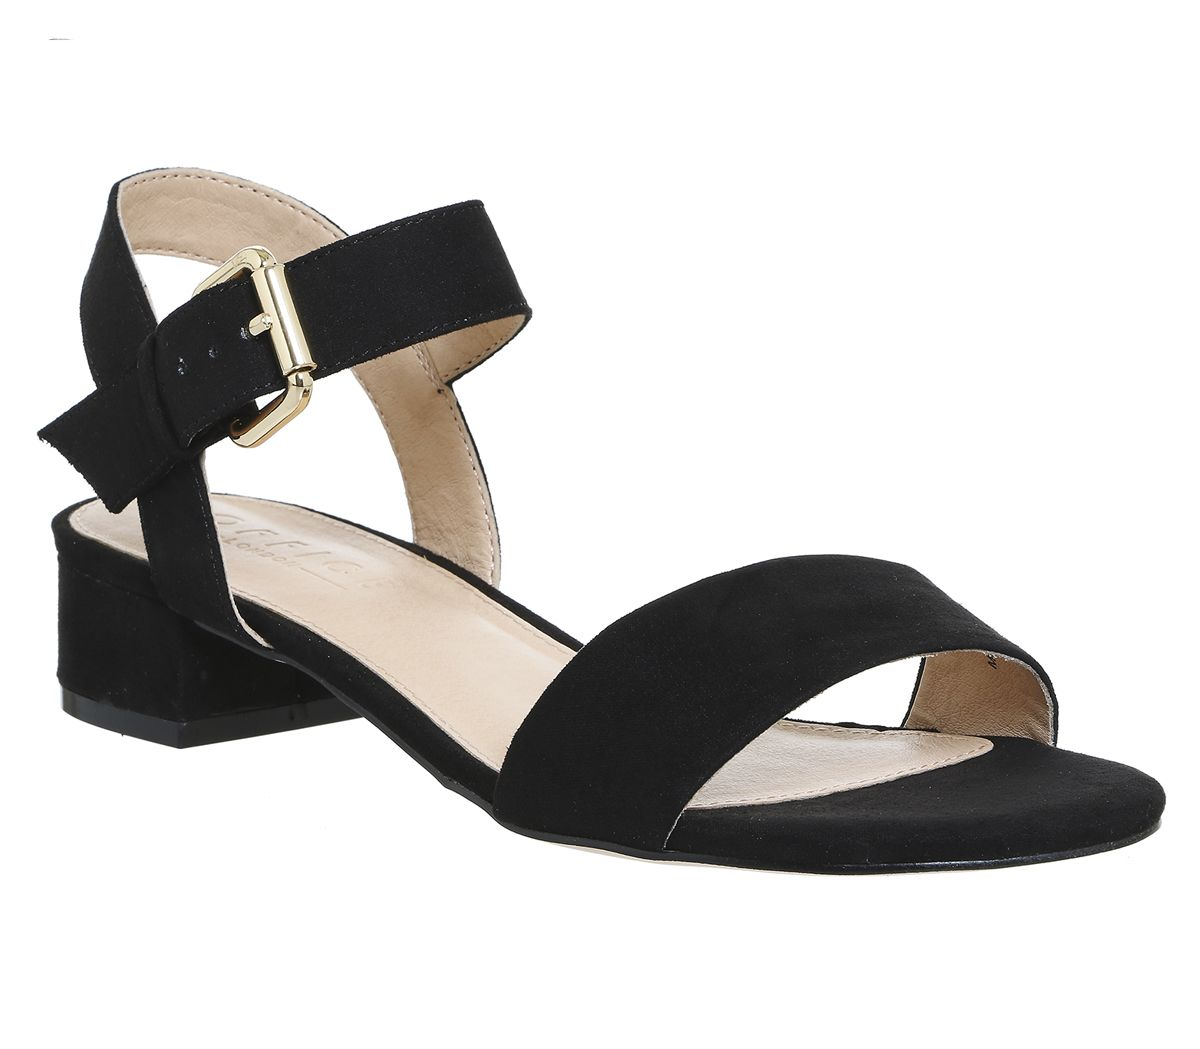 68c67817b0e Office Morgan Block Heel Sandals Black - Mid Heels